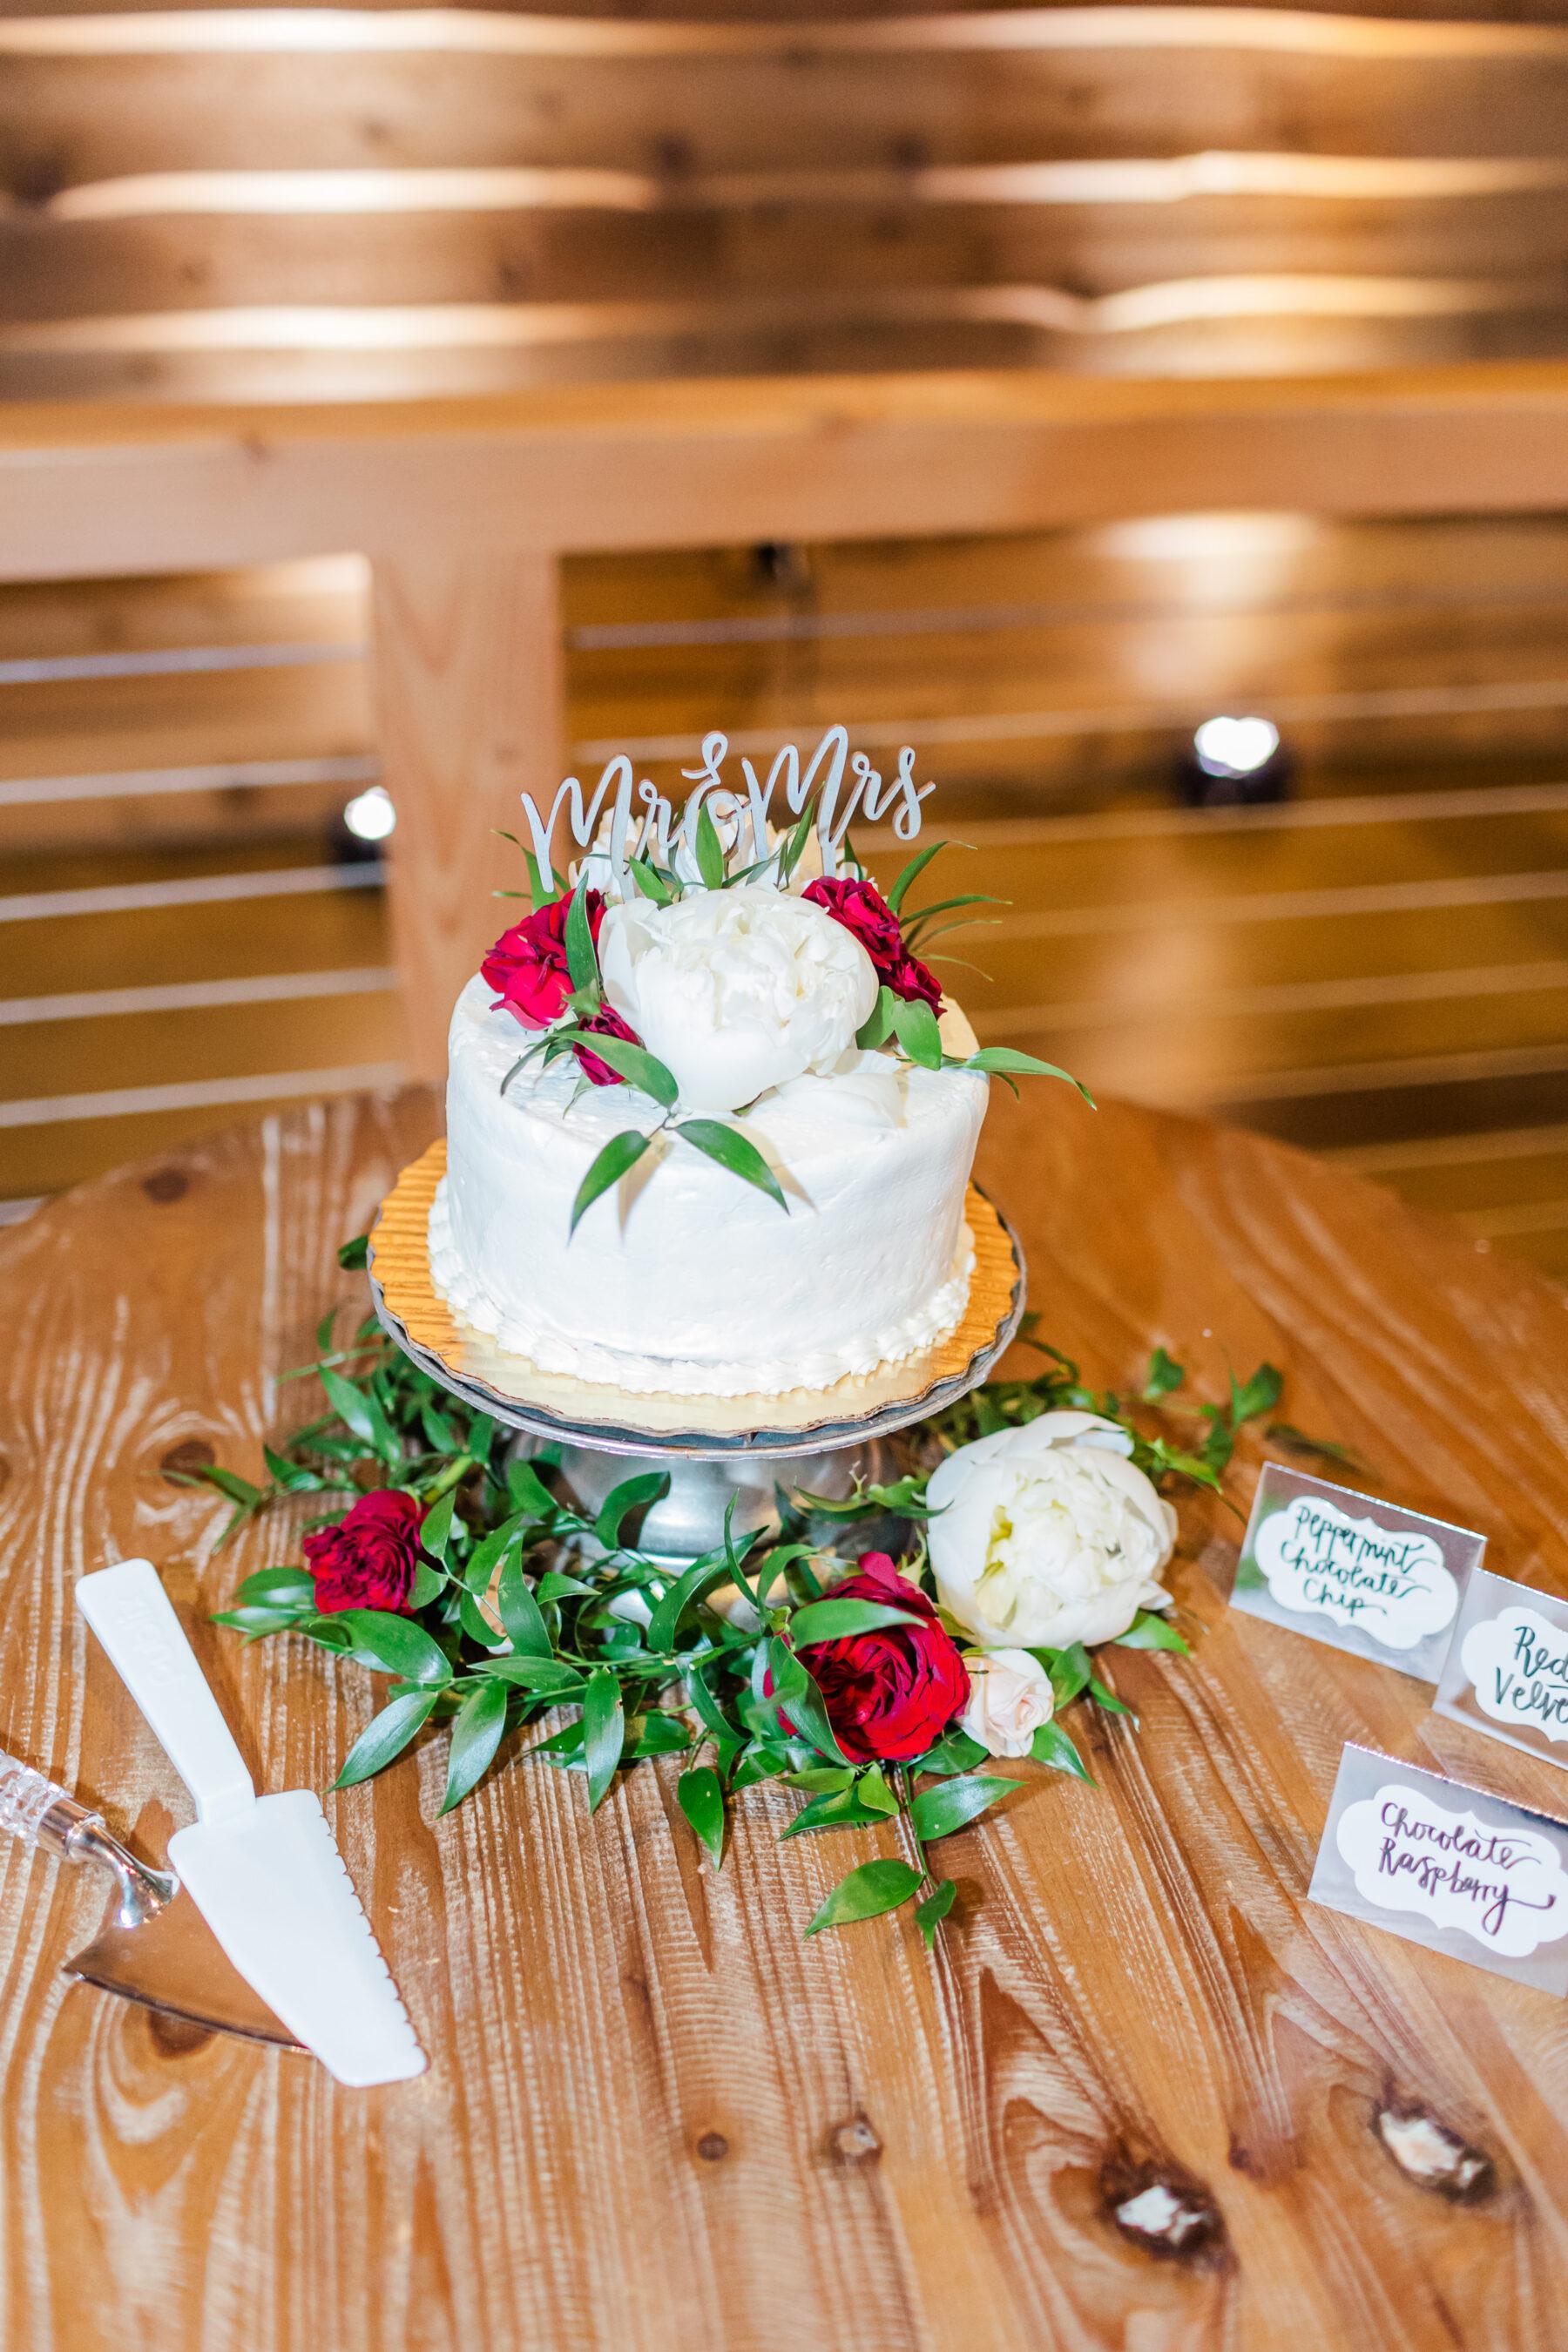 Nothing Bundt Cakes red and white wedding cake | Nashville Bride Guide